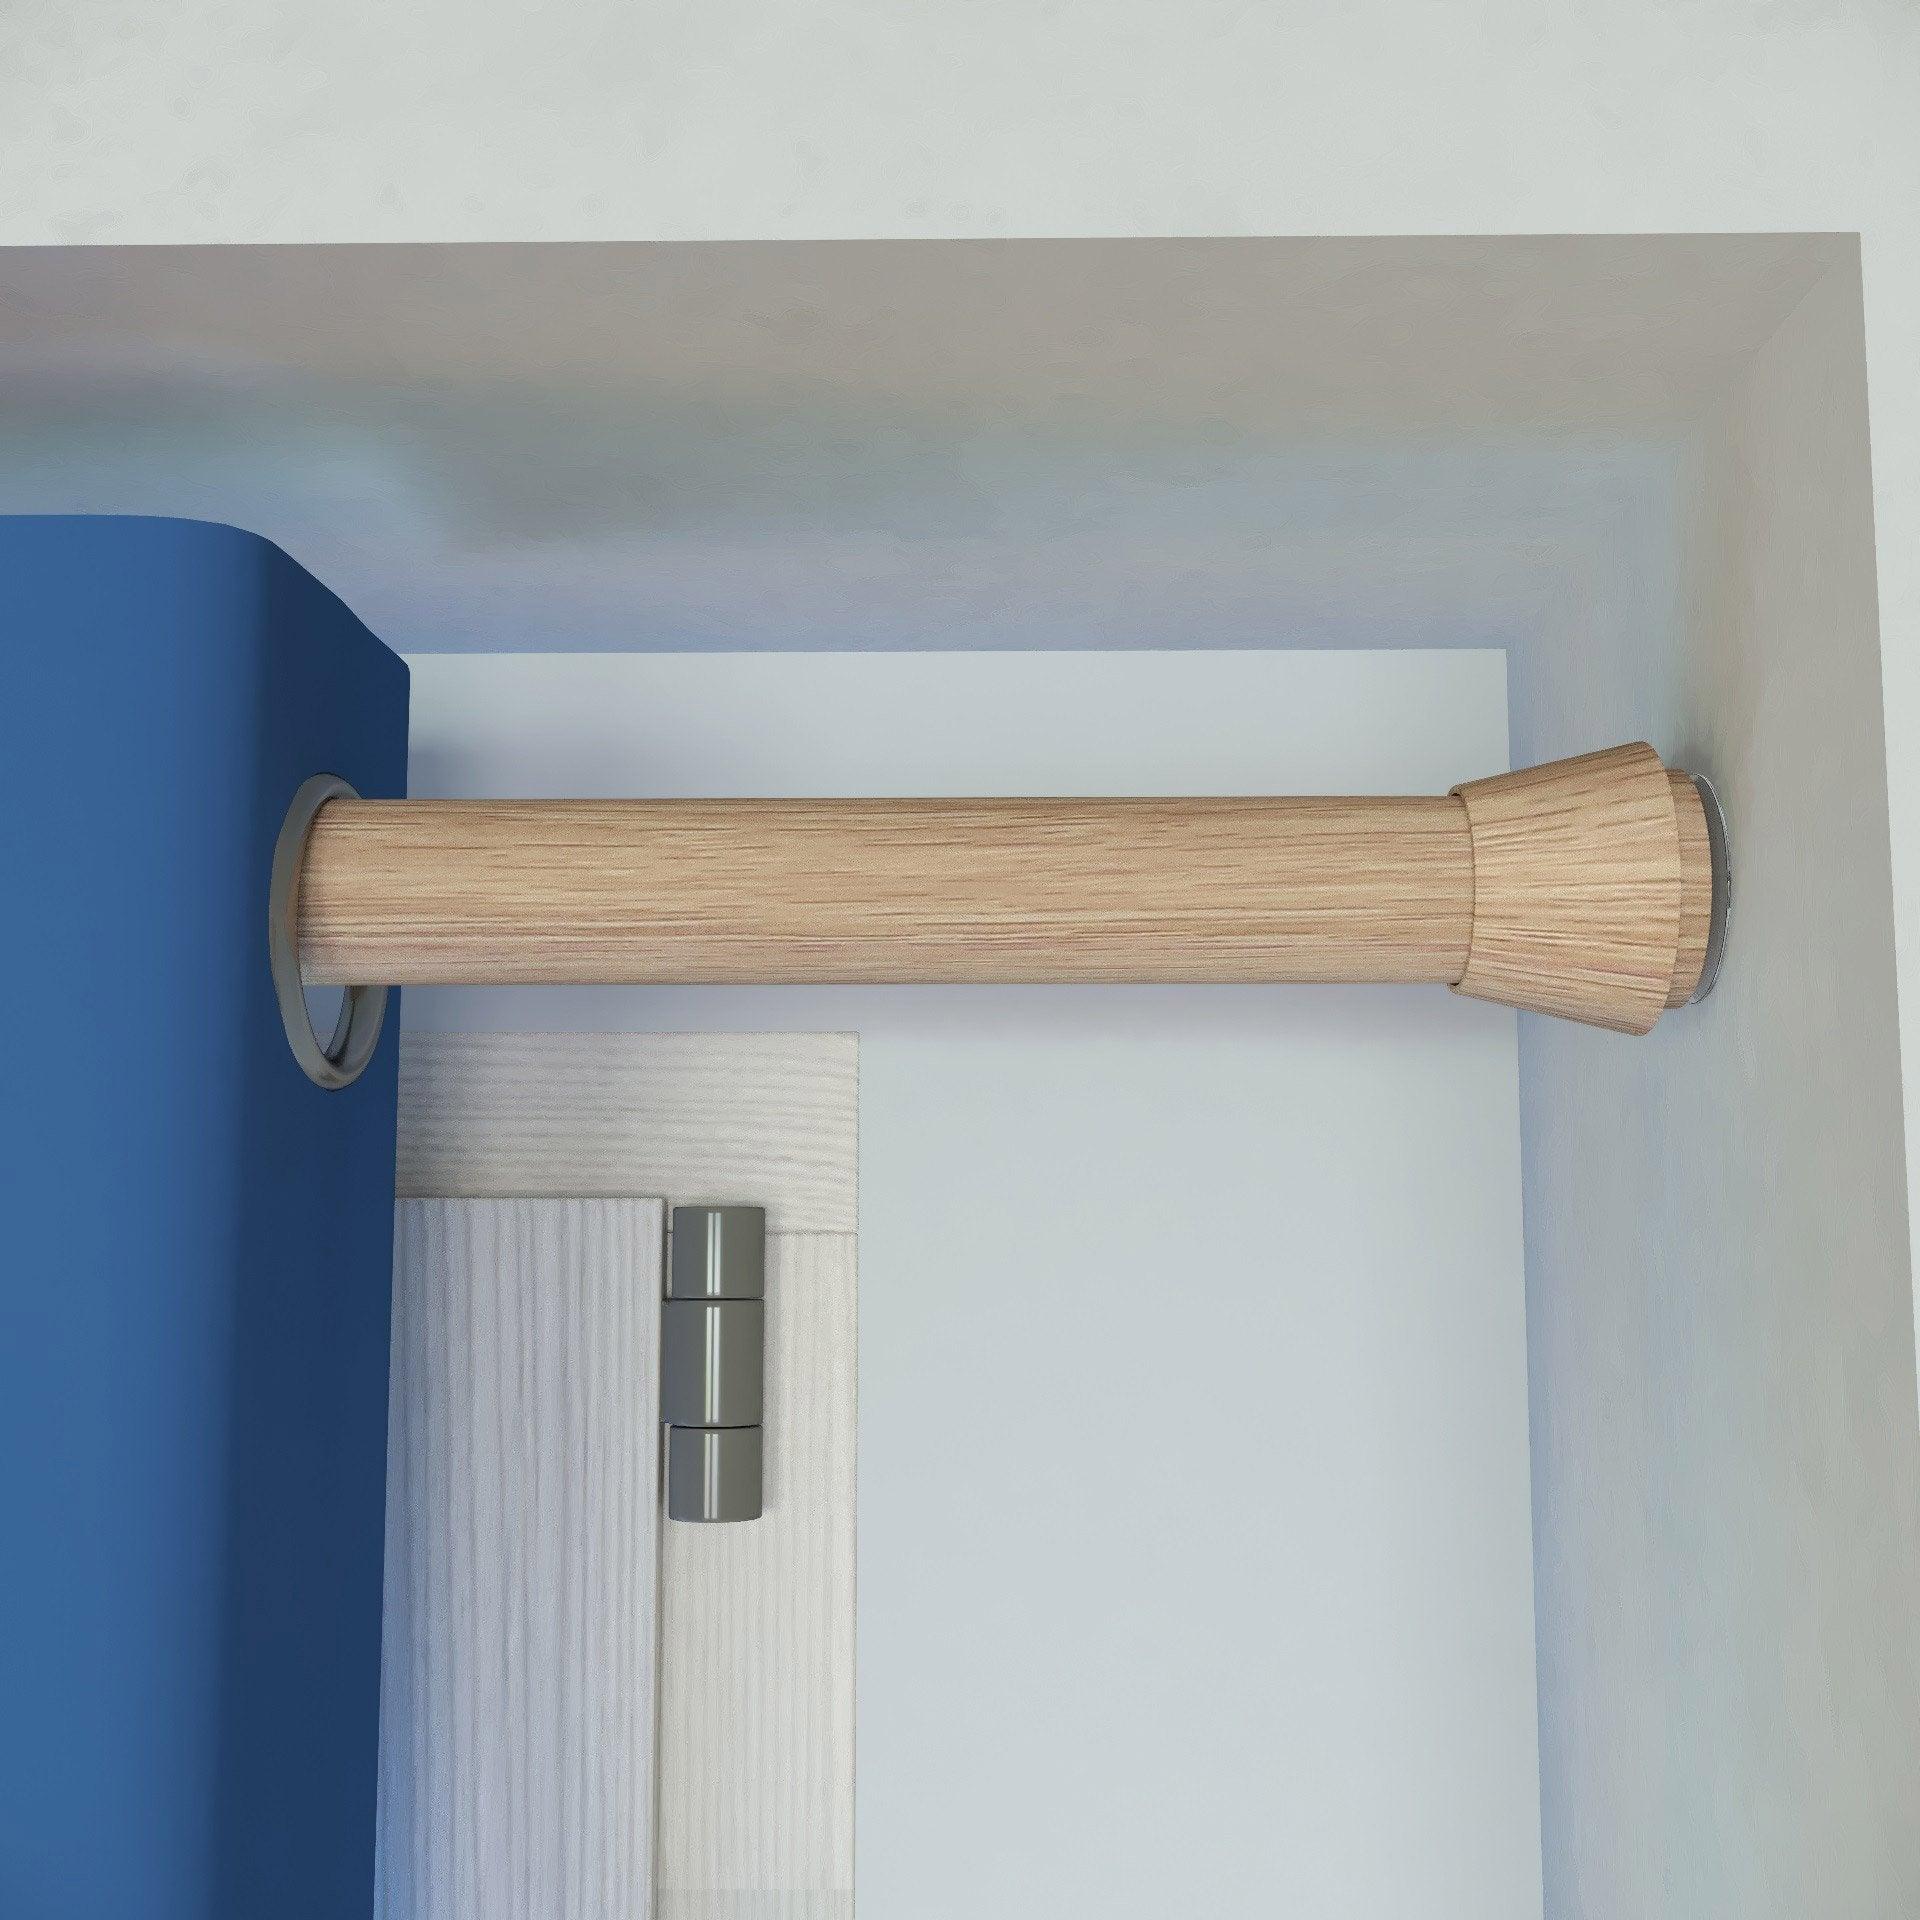 Kit de tringle à rideau Yuko Diam. 28 mm Chêne clair naturel 140X240 cm